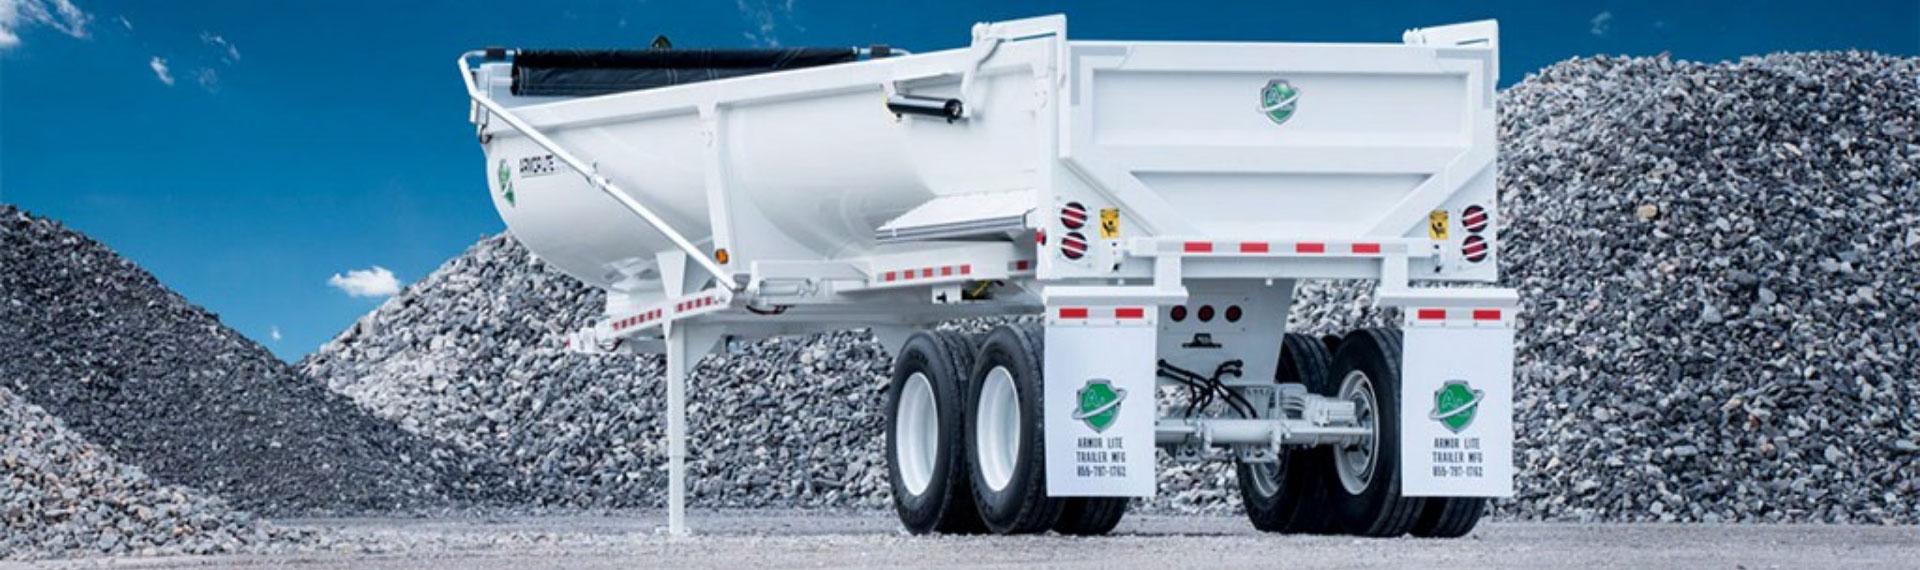 A white half-round dump trailer in steel bearing the Hardox In My Body logo.